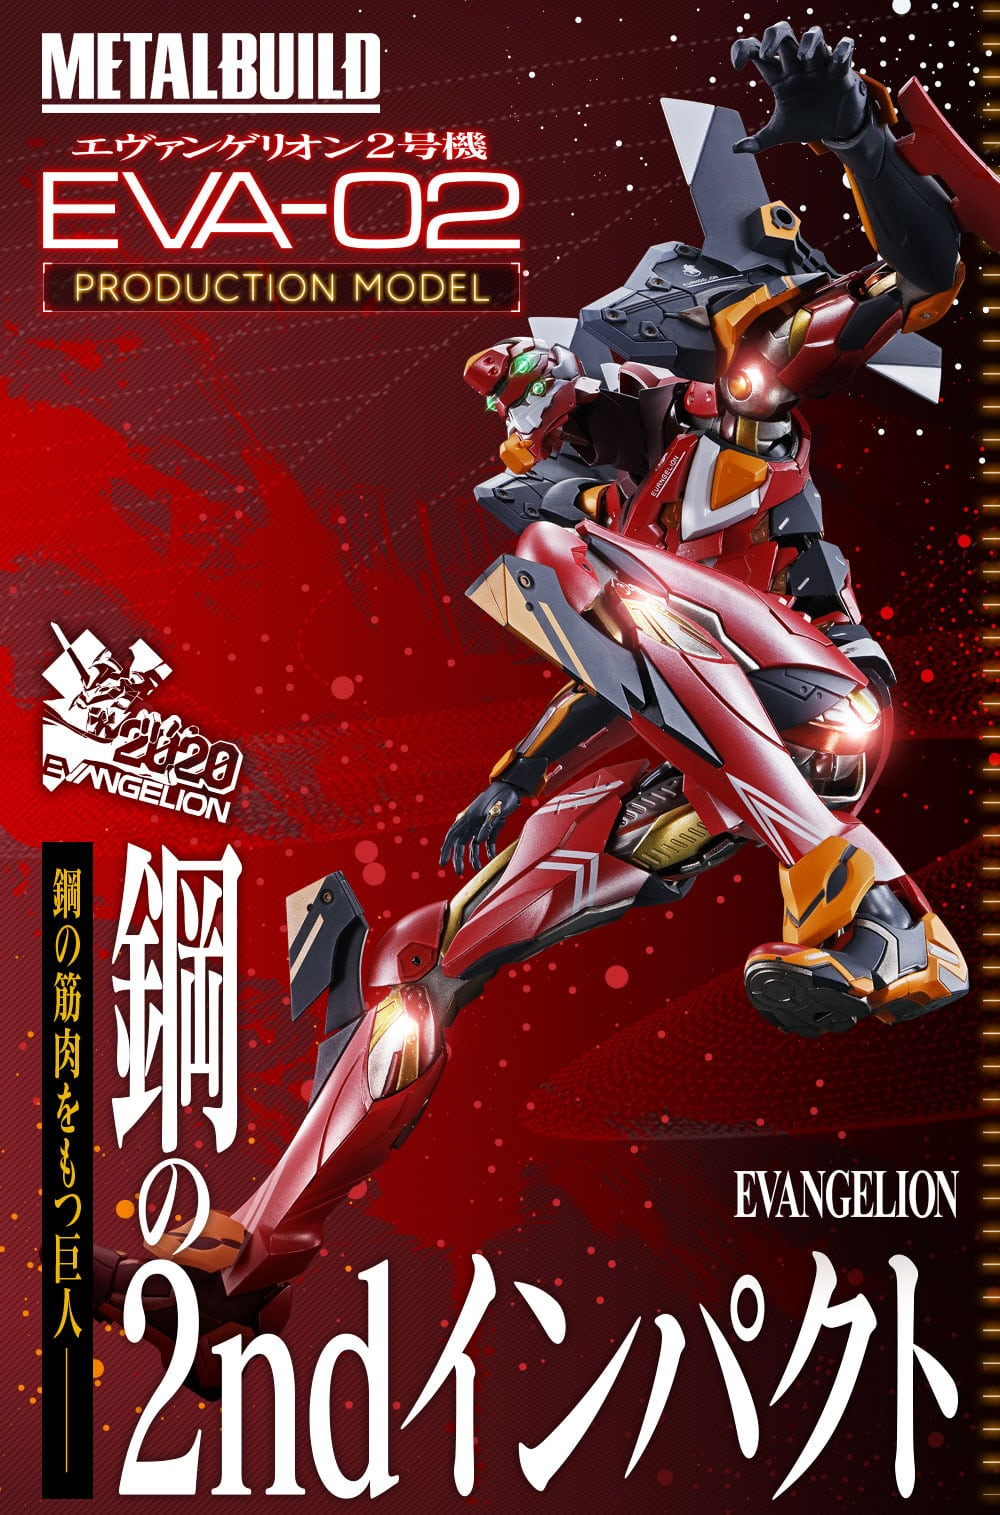 Bandai Metal Build Evangelion Shin Gekijouban EVA-02 Figure